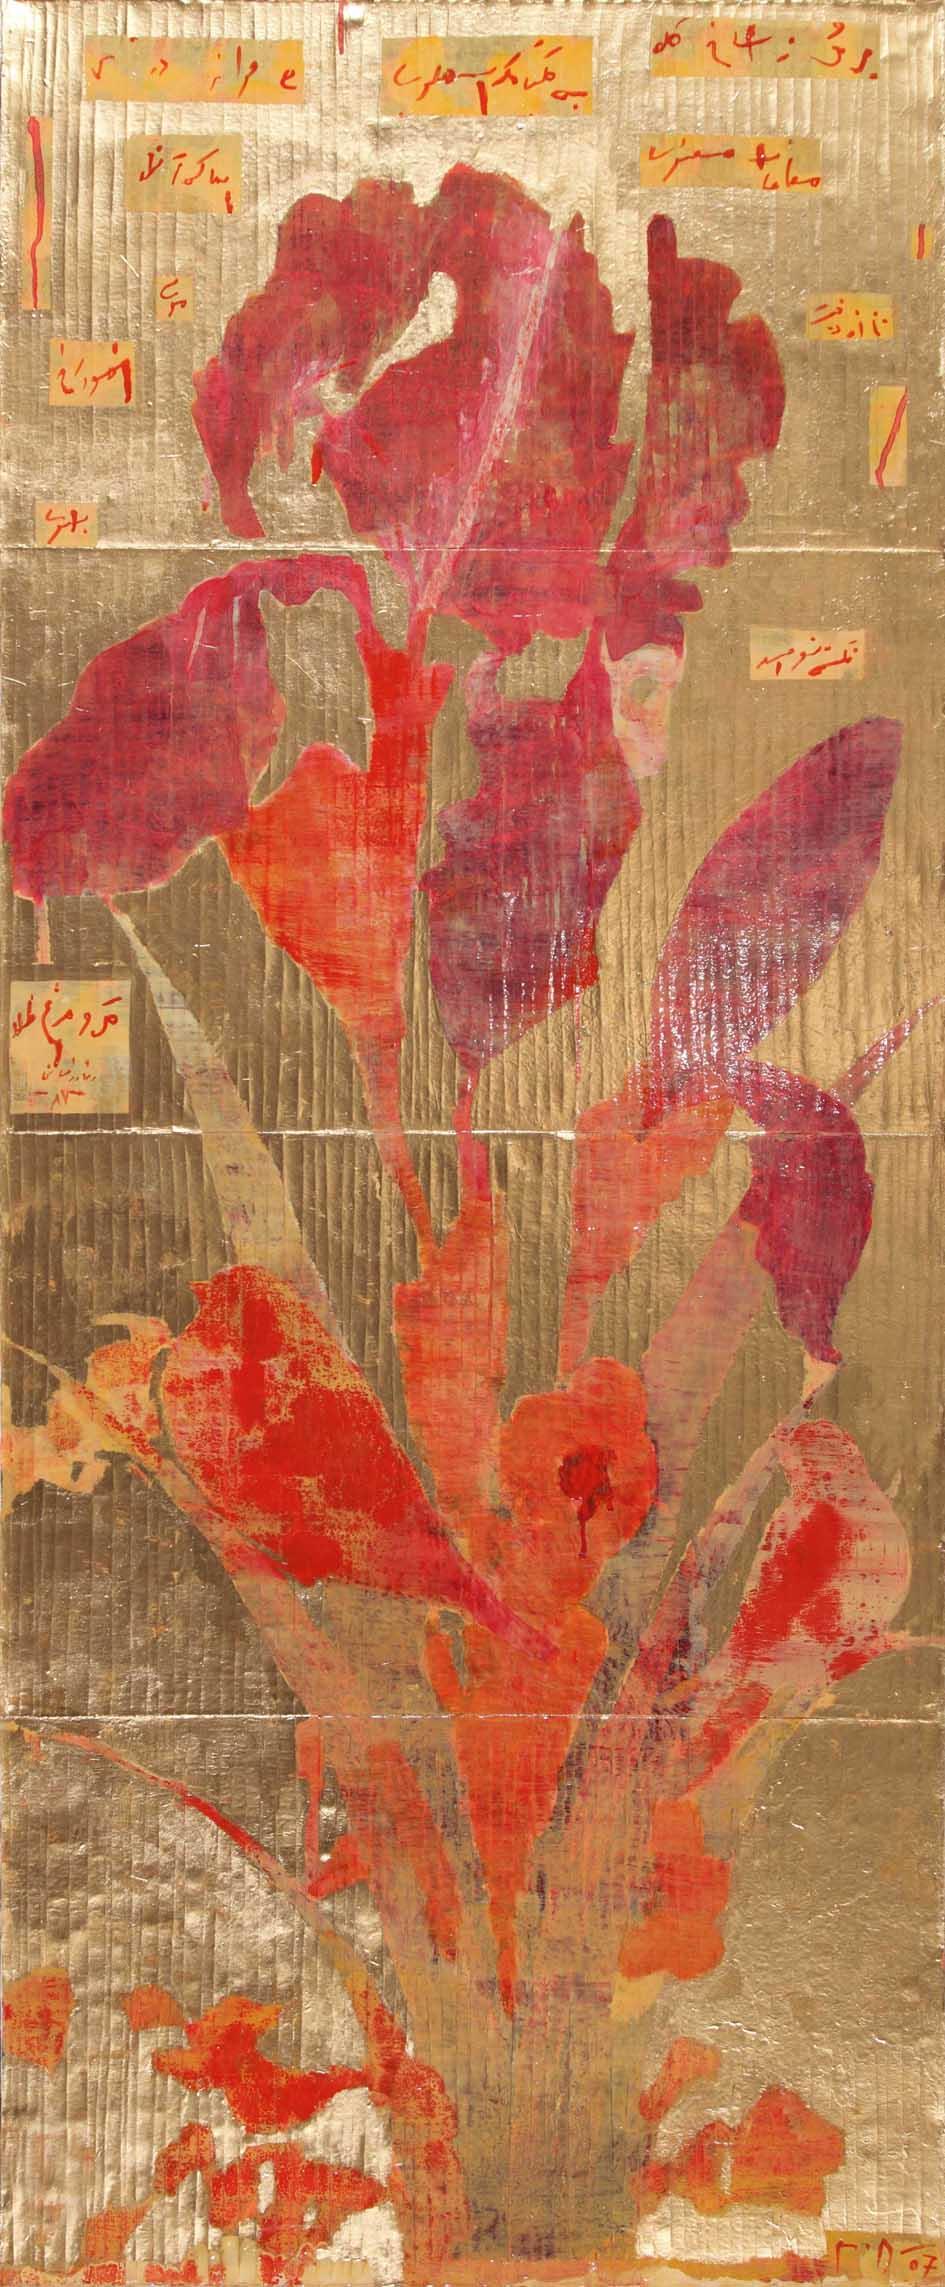 Reza Derakshani - Flower and Bird Series, Mixed Media on Canvas, 220x90cm, 2009, 28000dollars.jpg